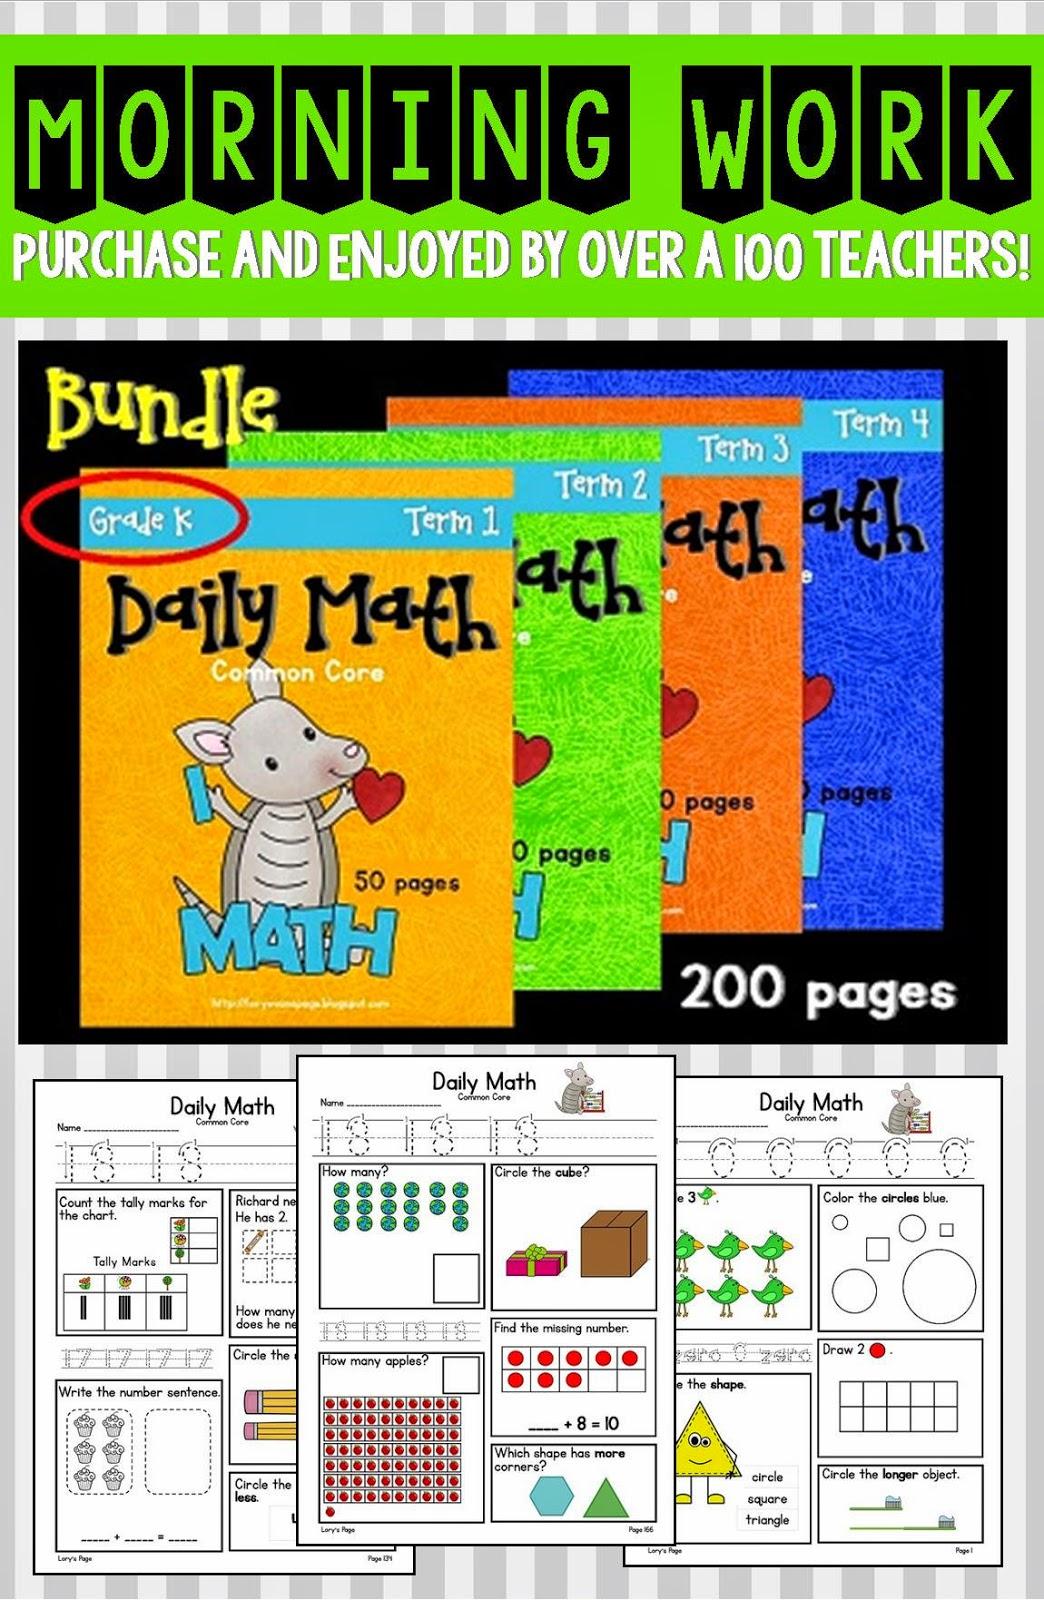 Lory's 2nd Grade Skills: Daily Math Kindergarten